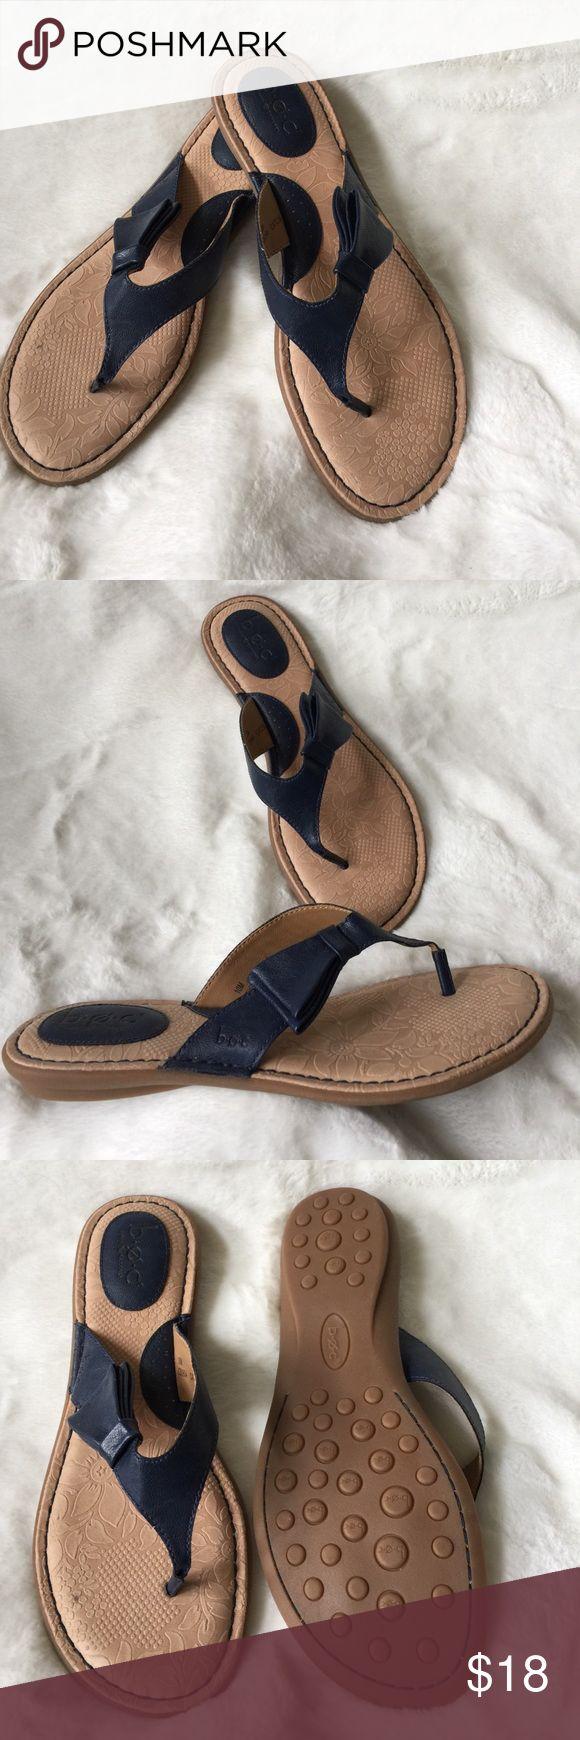 Navy sandals Navy flip flop sandals. Worn once. b.o.c. Shoes Sandals